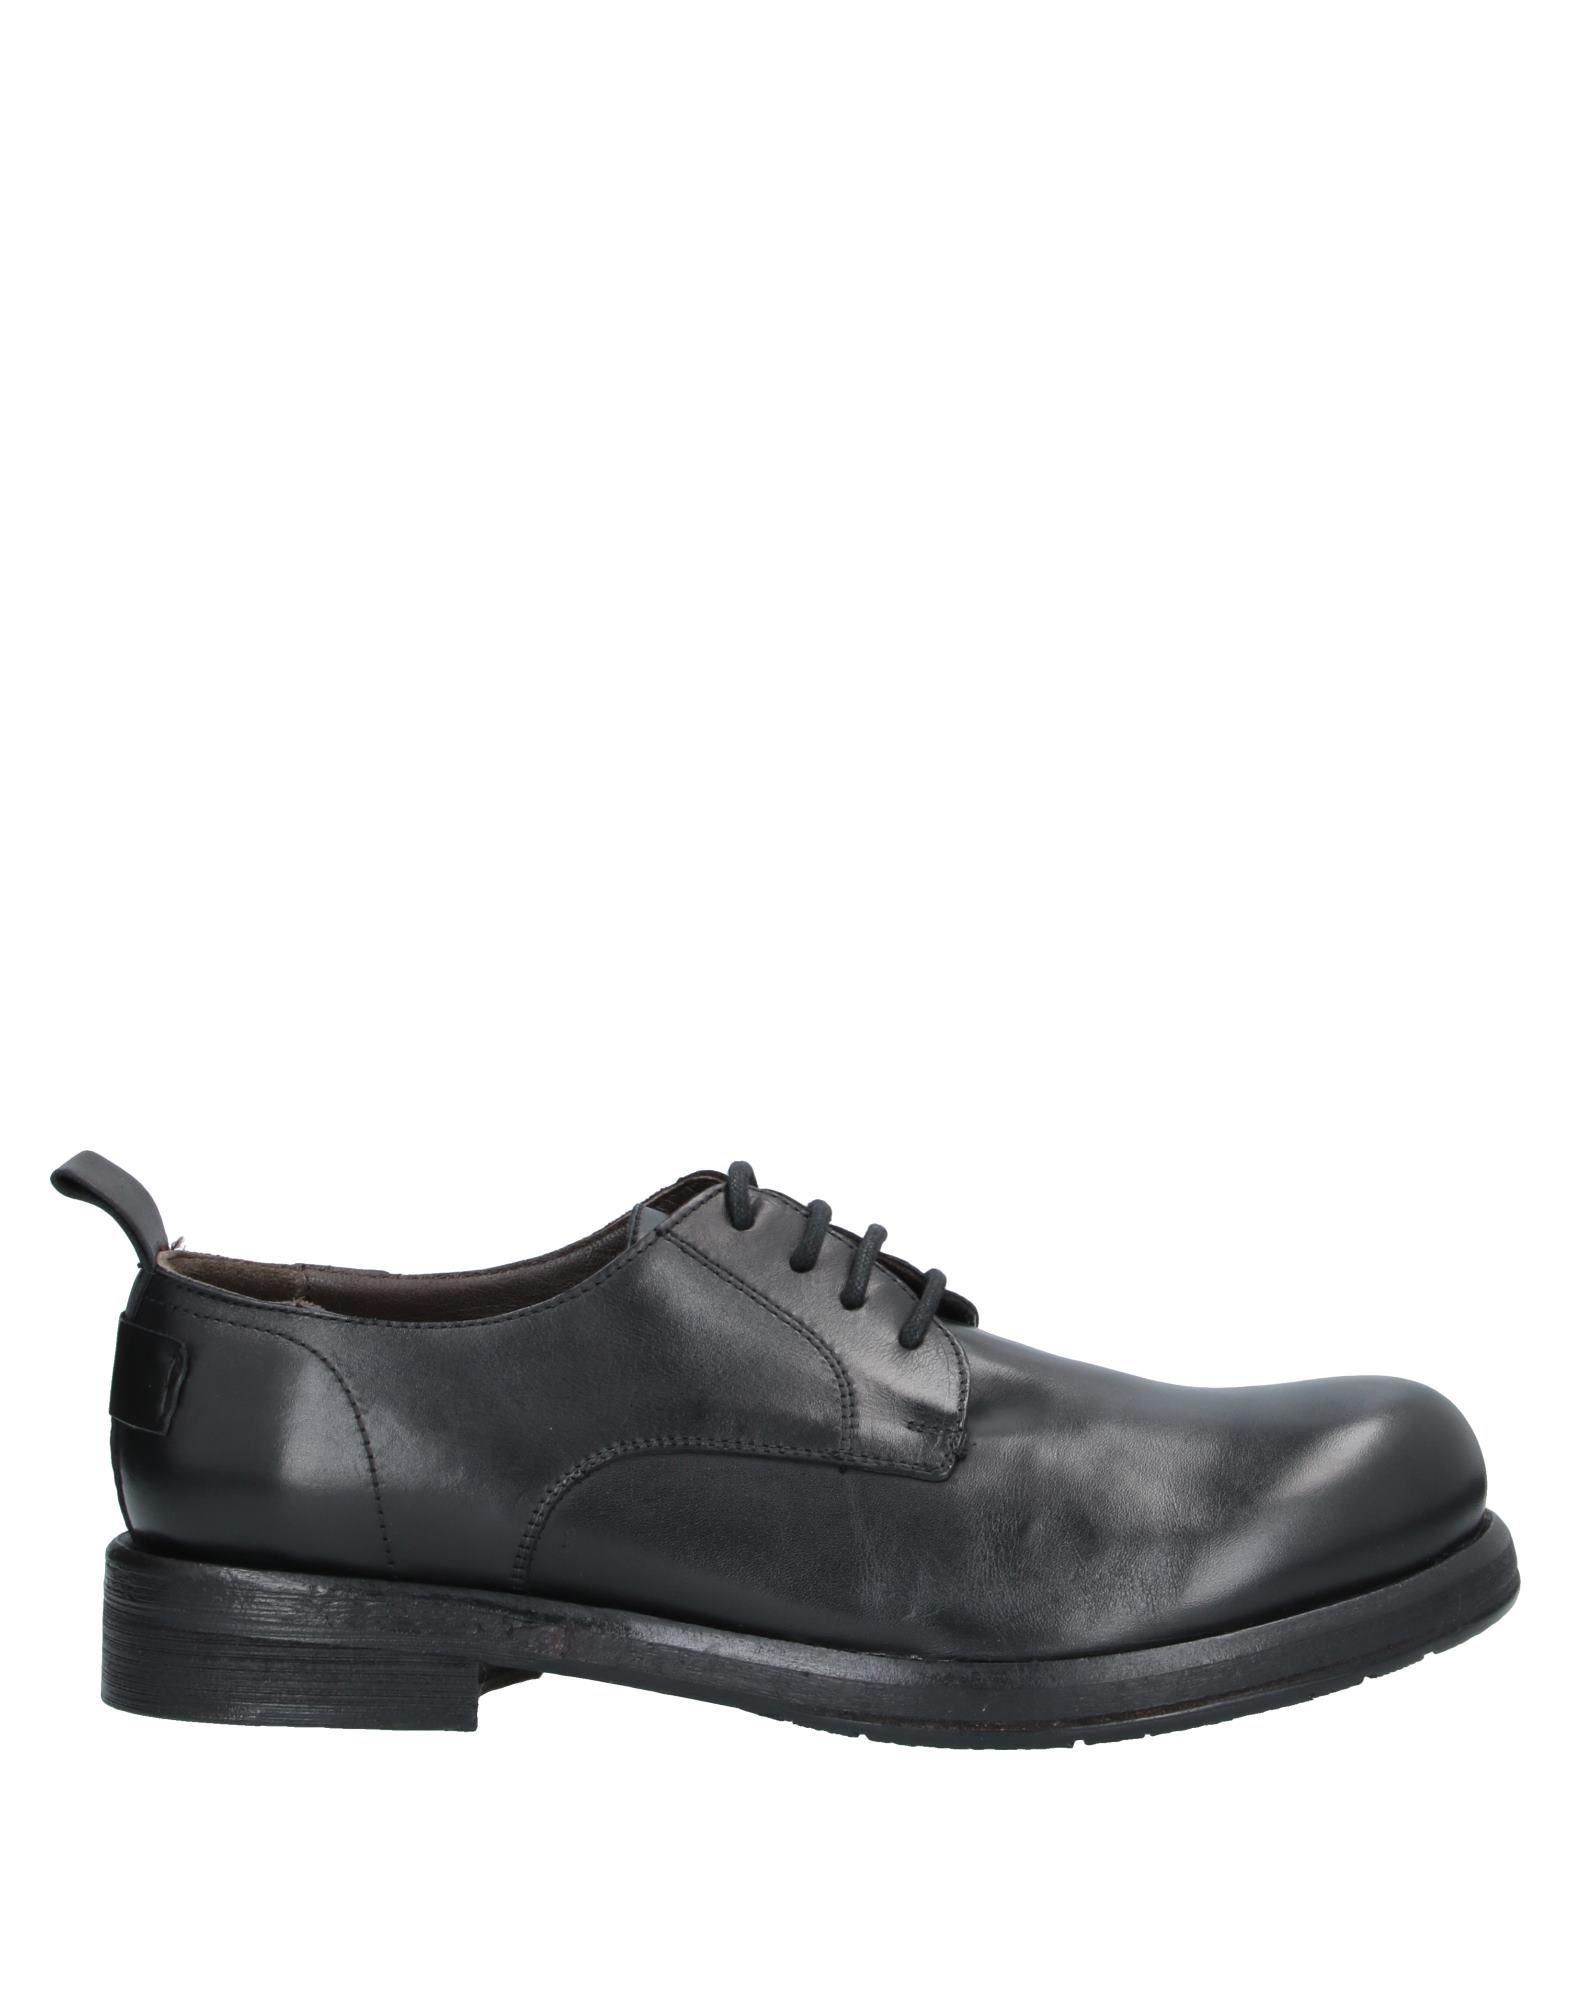 Chaussures À Lacets Jp David Homme - Chaussures À Lacets Jp David   - 11720110HT